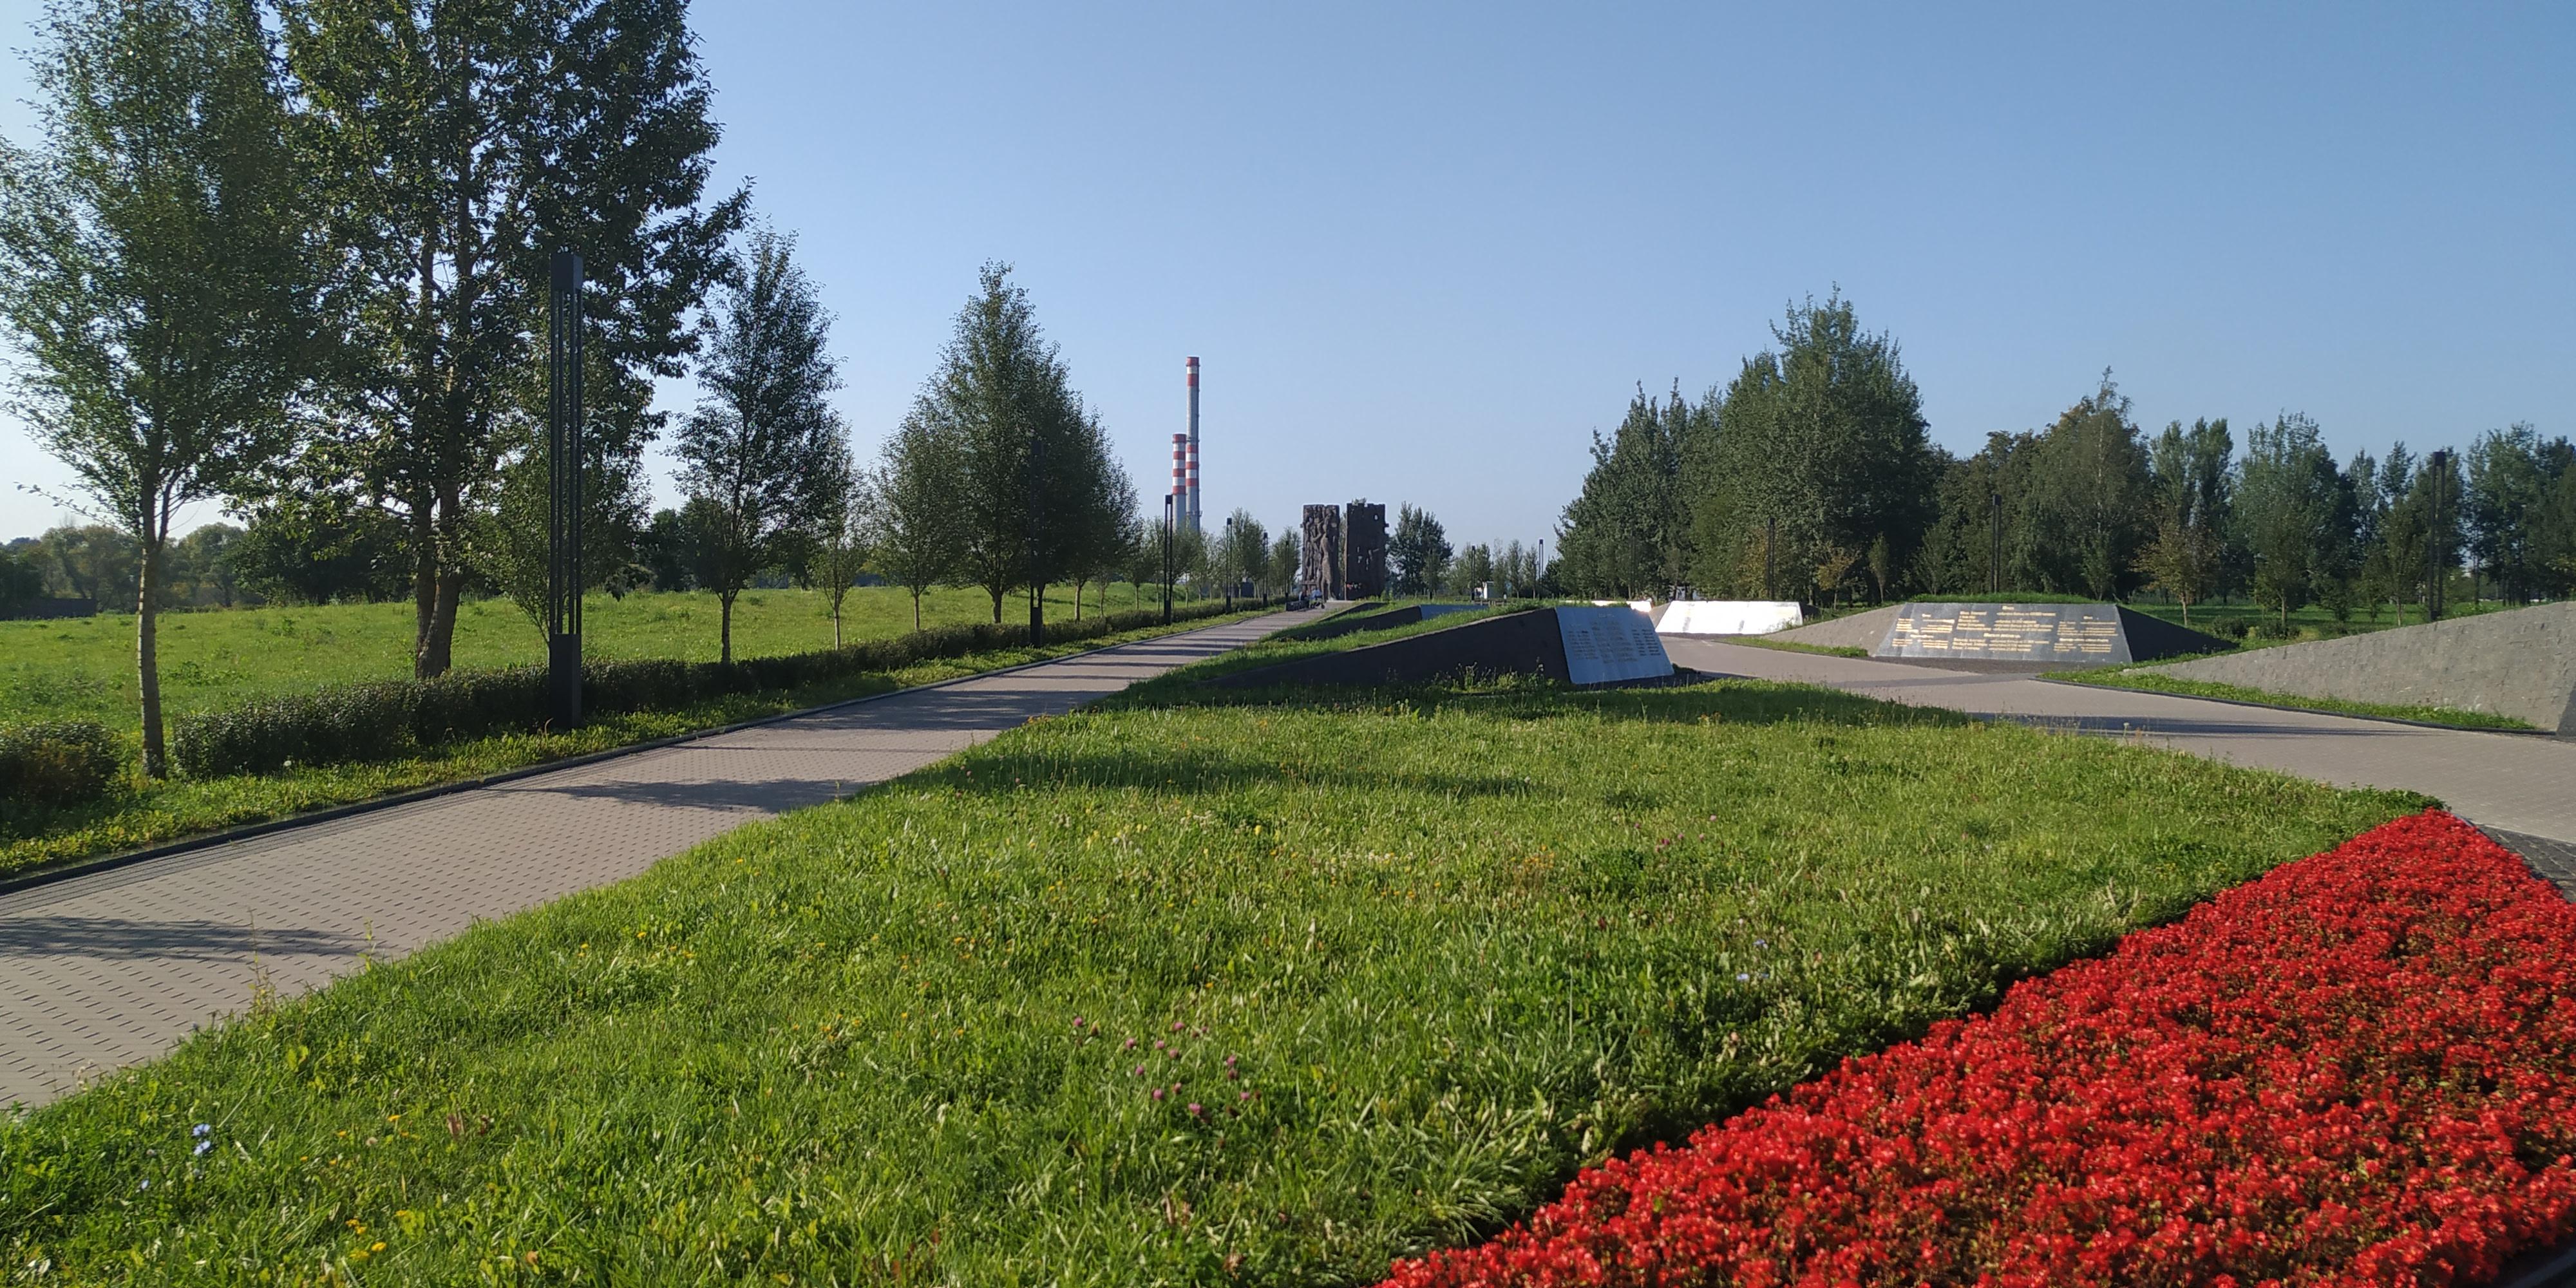 Go to the War Memorial